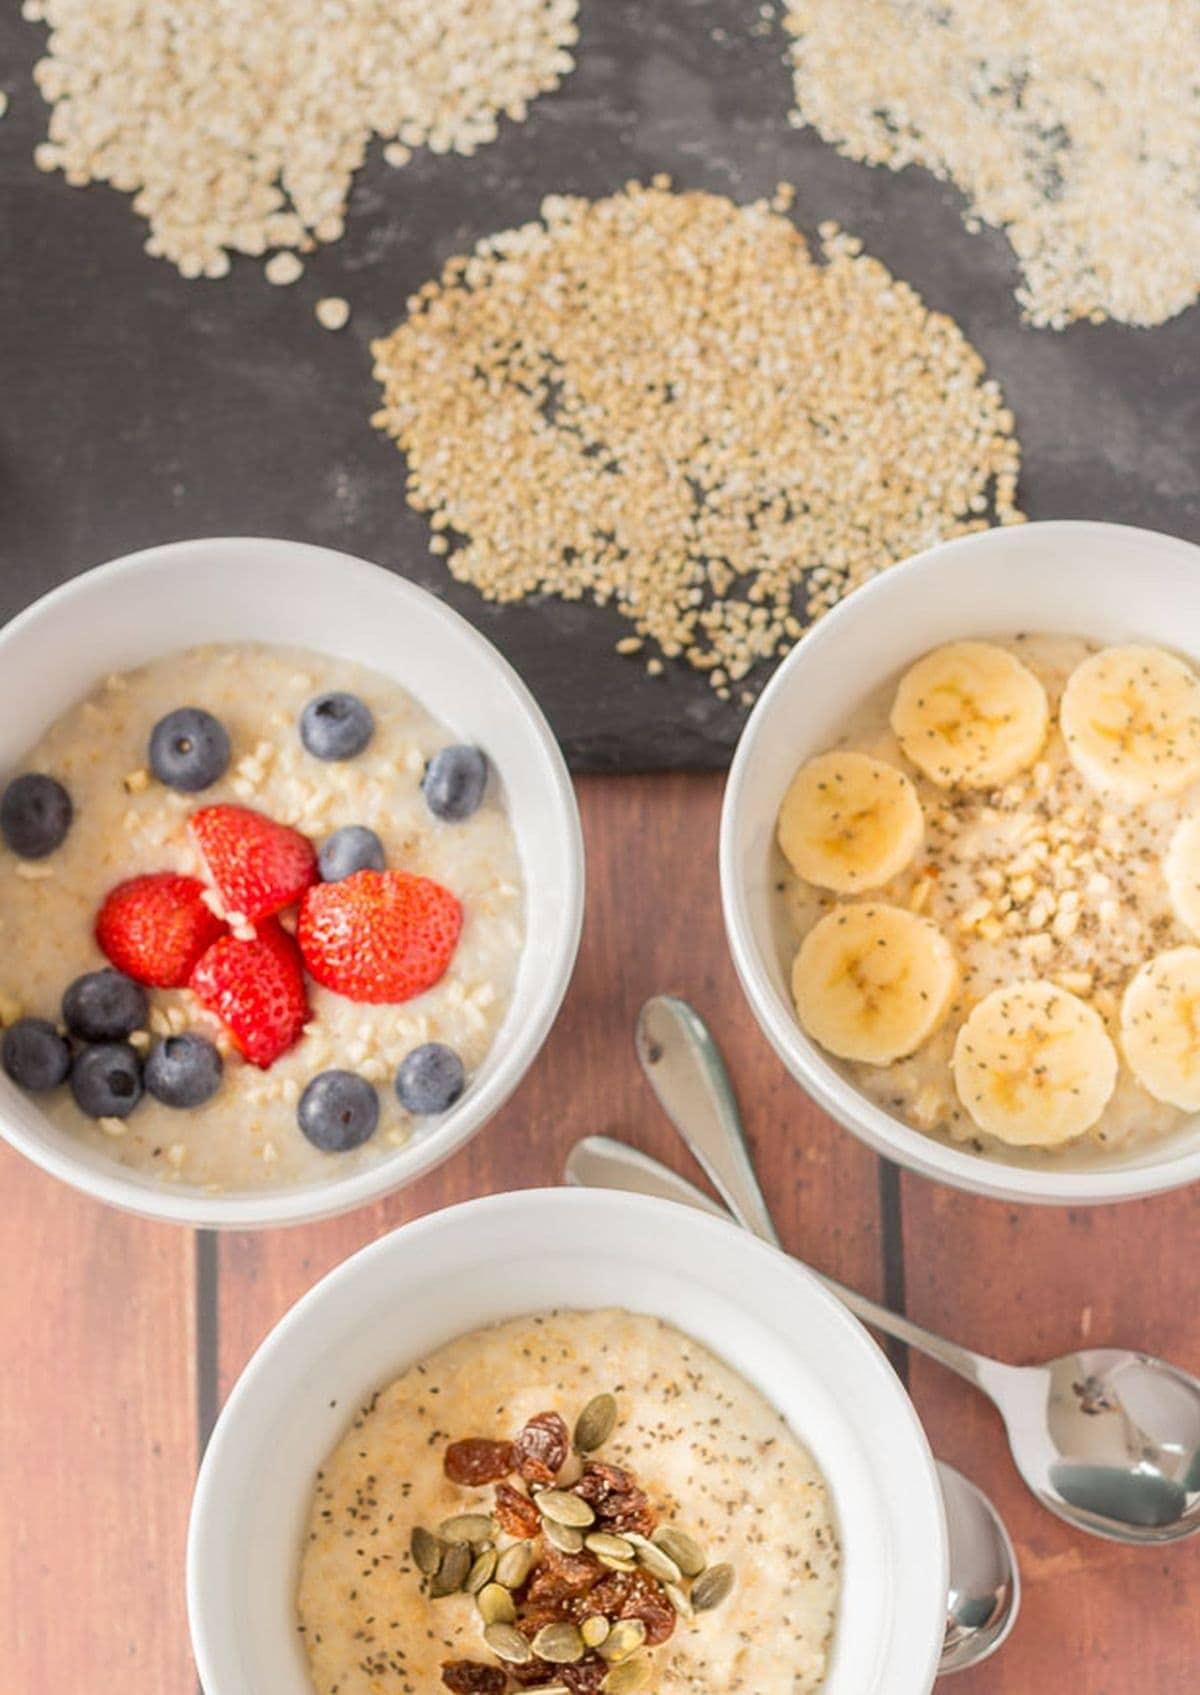 Birds eye view of 3 different types of cooked breakfast porridges. Porridge oats, oatmeal and pinhead oats.